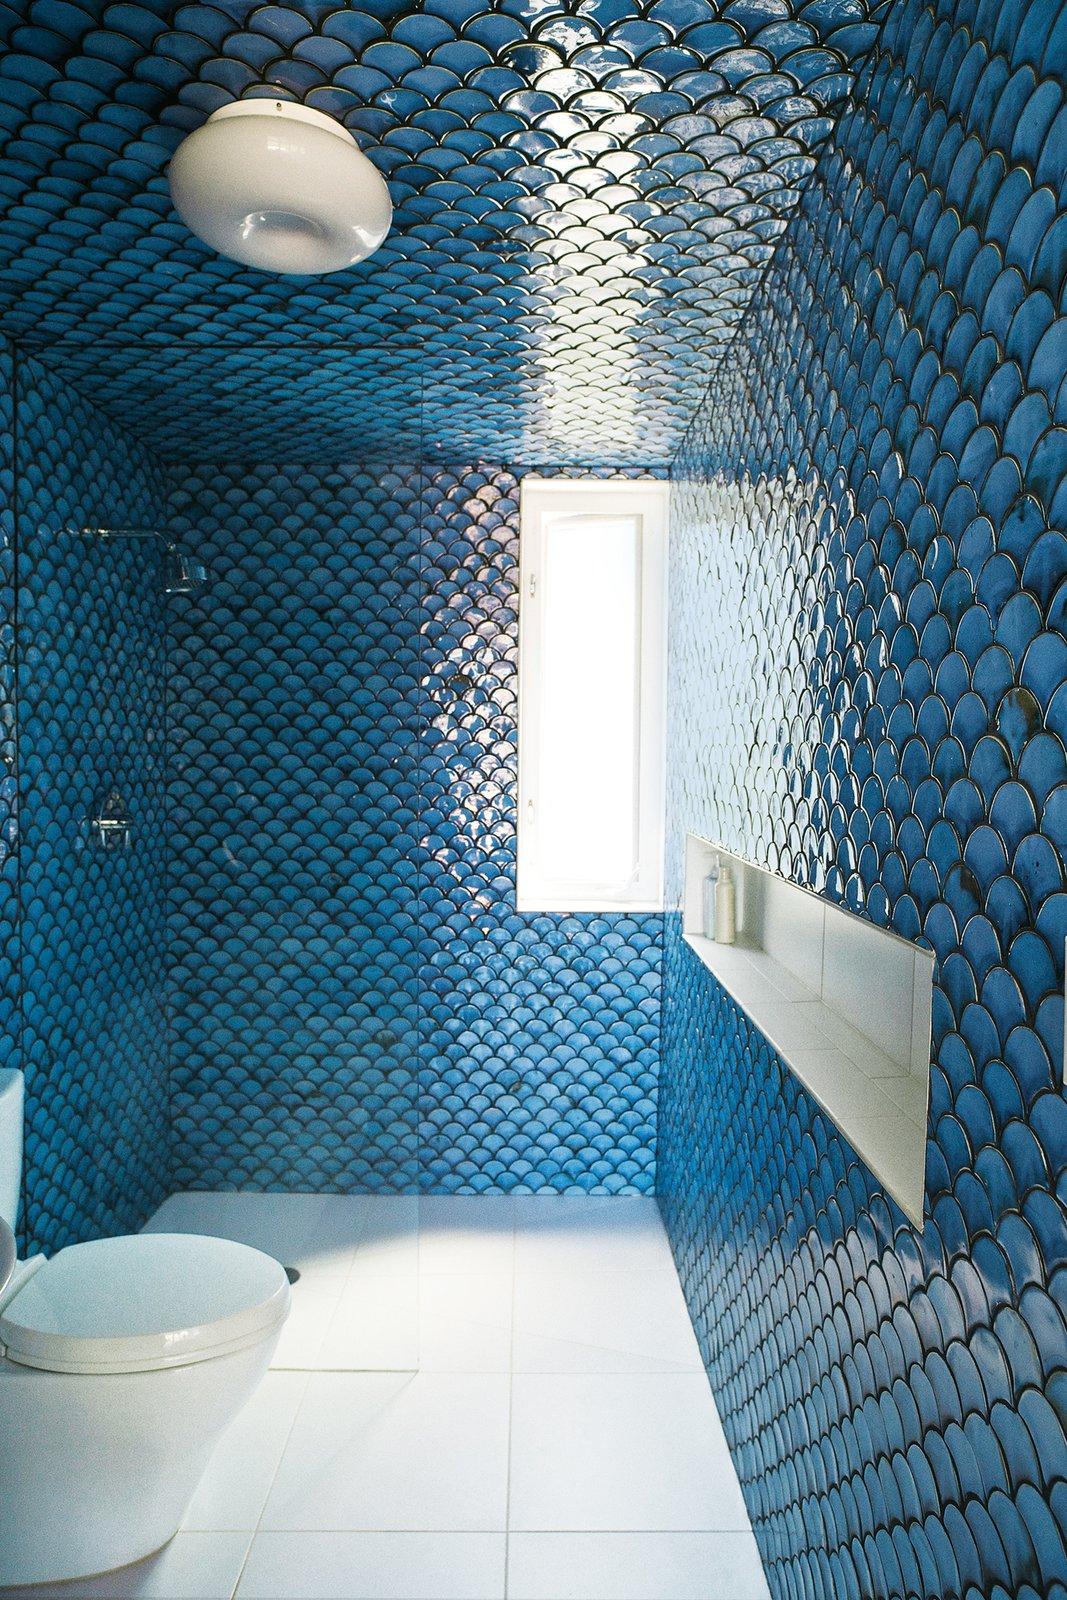 Bath Room, Ceramic Tile Floor, and Ceramic Tile Wall #bath #spa #bath&spa #modern #interior #interiordesign #bathroom #shower #tile #walltile #desimio #renovation  Photo by Paul Barbera   Photo 3 of 22 in Bath & Spa Intrigue from Bath